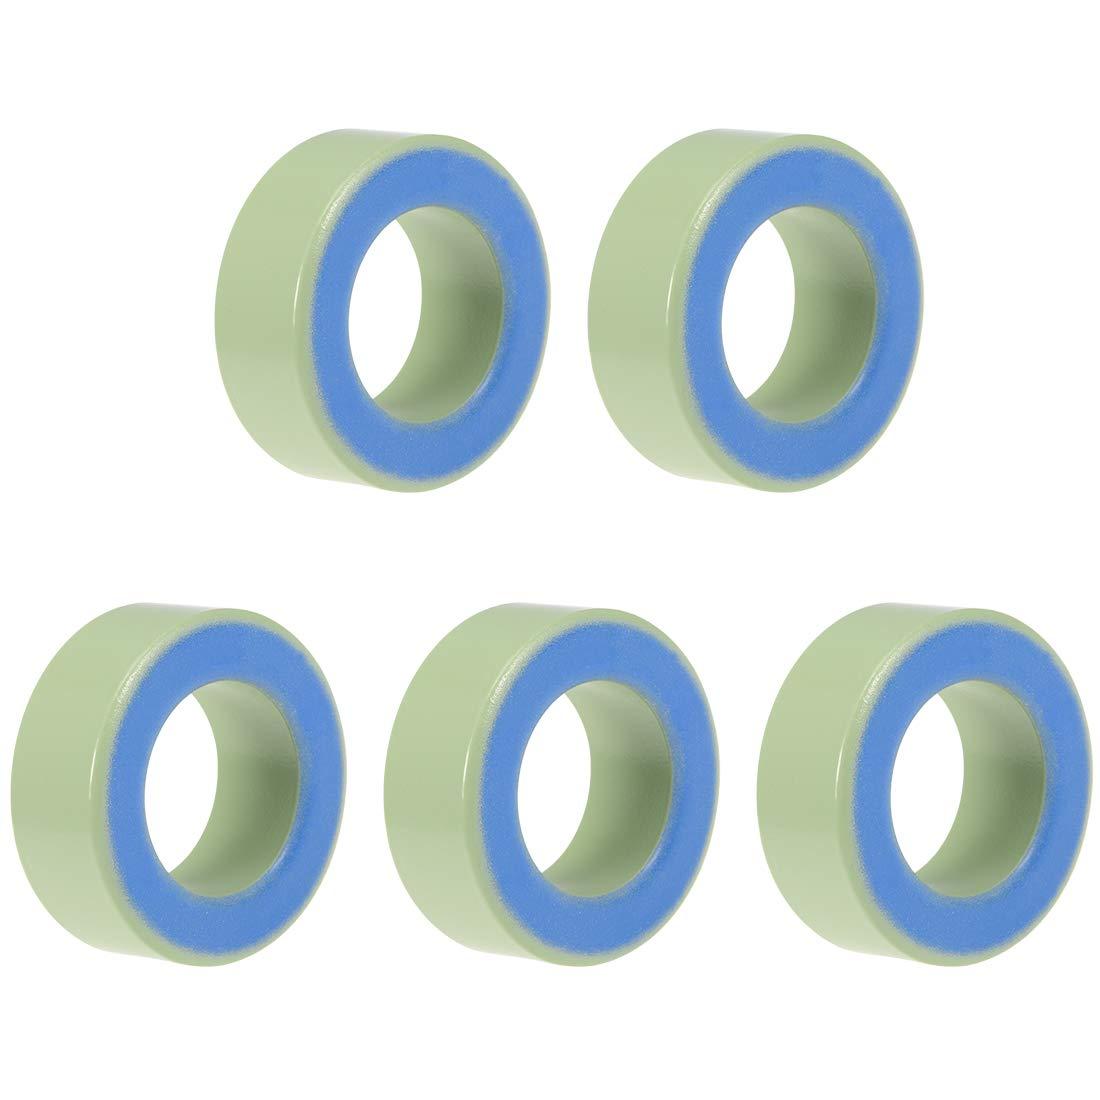 uxcell 5pcs 26.9 x 45 x 16.8mm Ferrite Ring Iron Powder Toroid Cores Light Green Blue